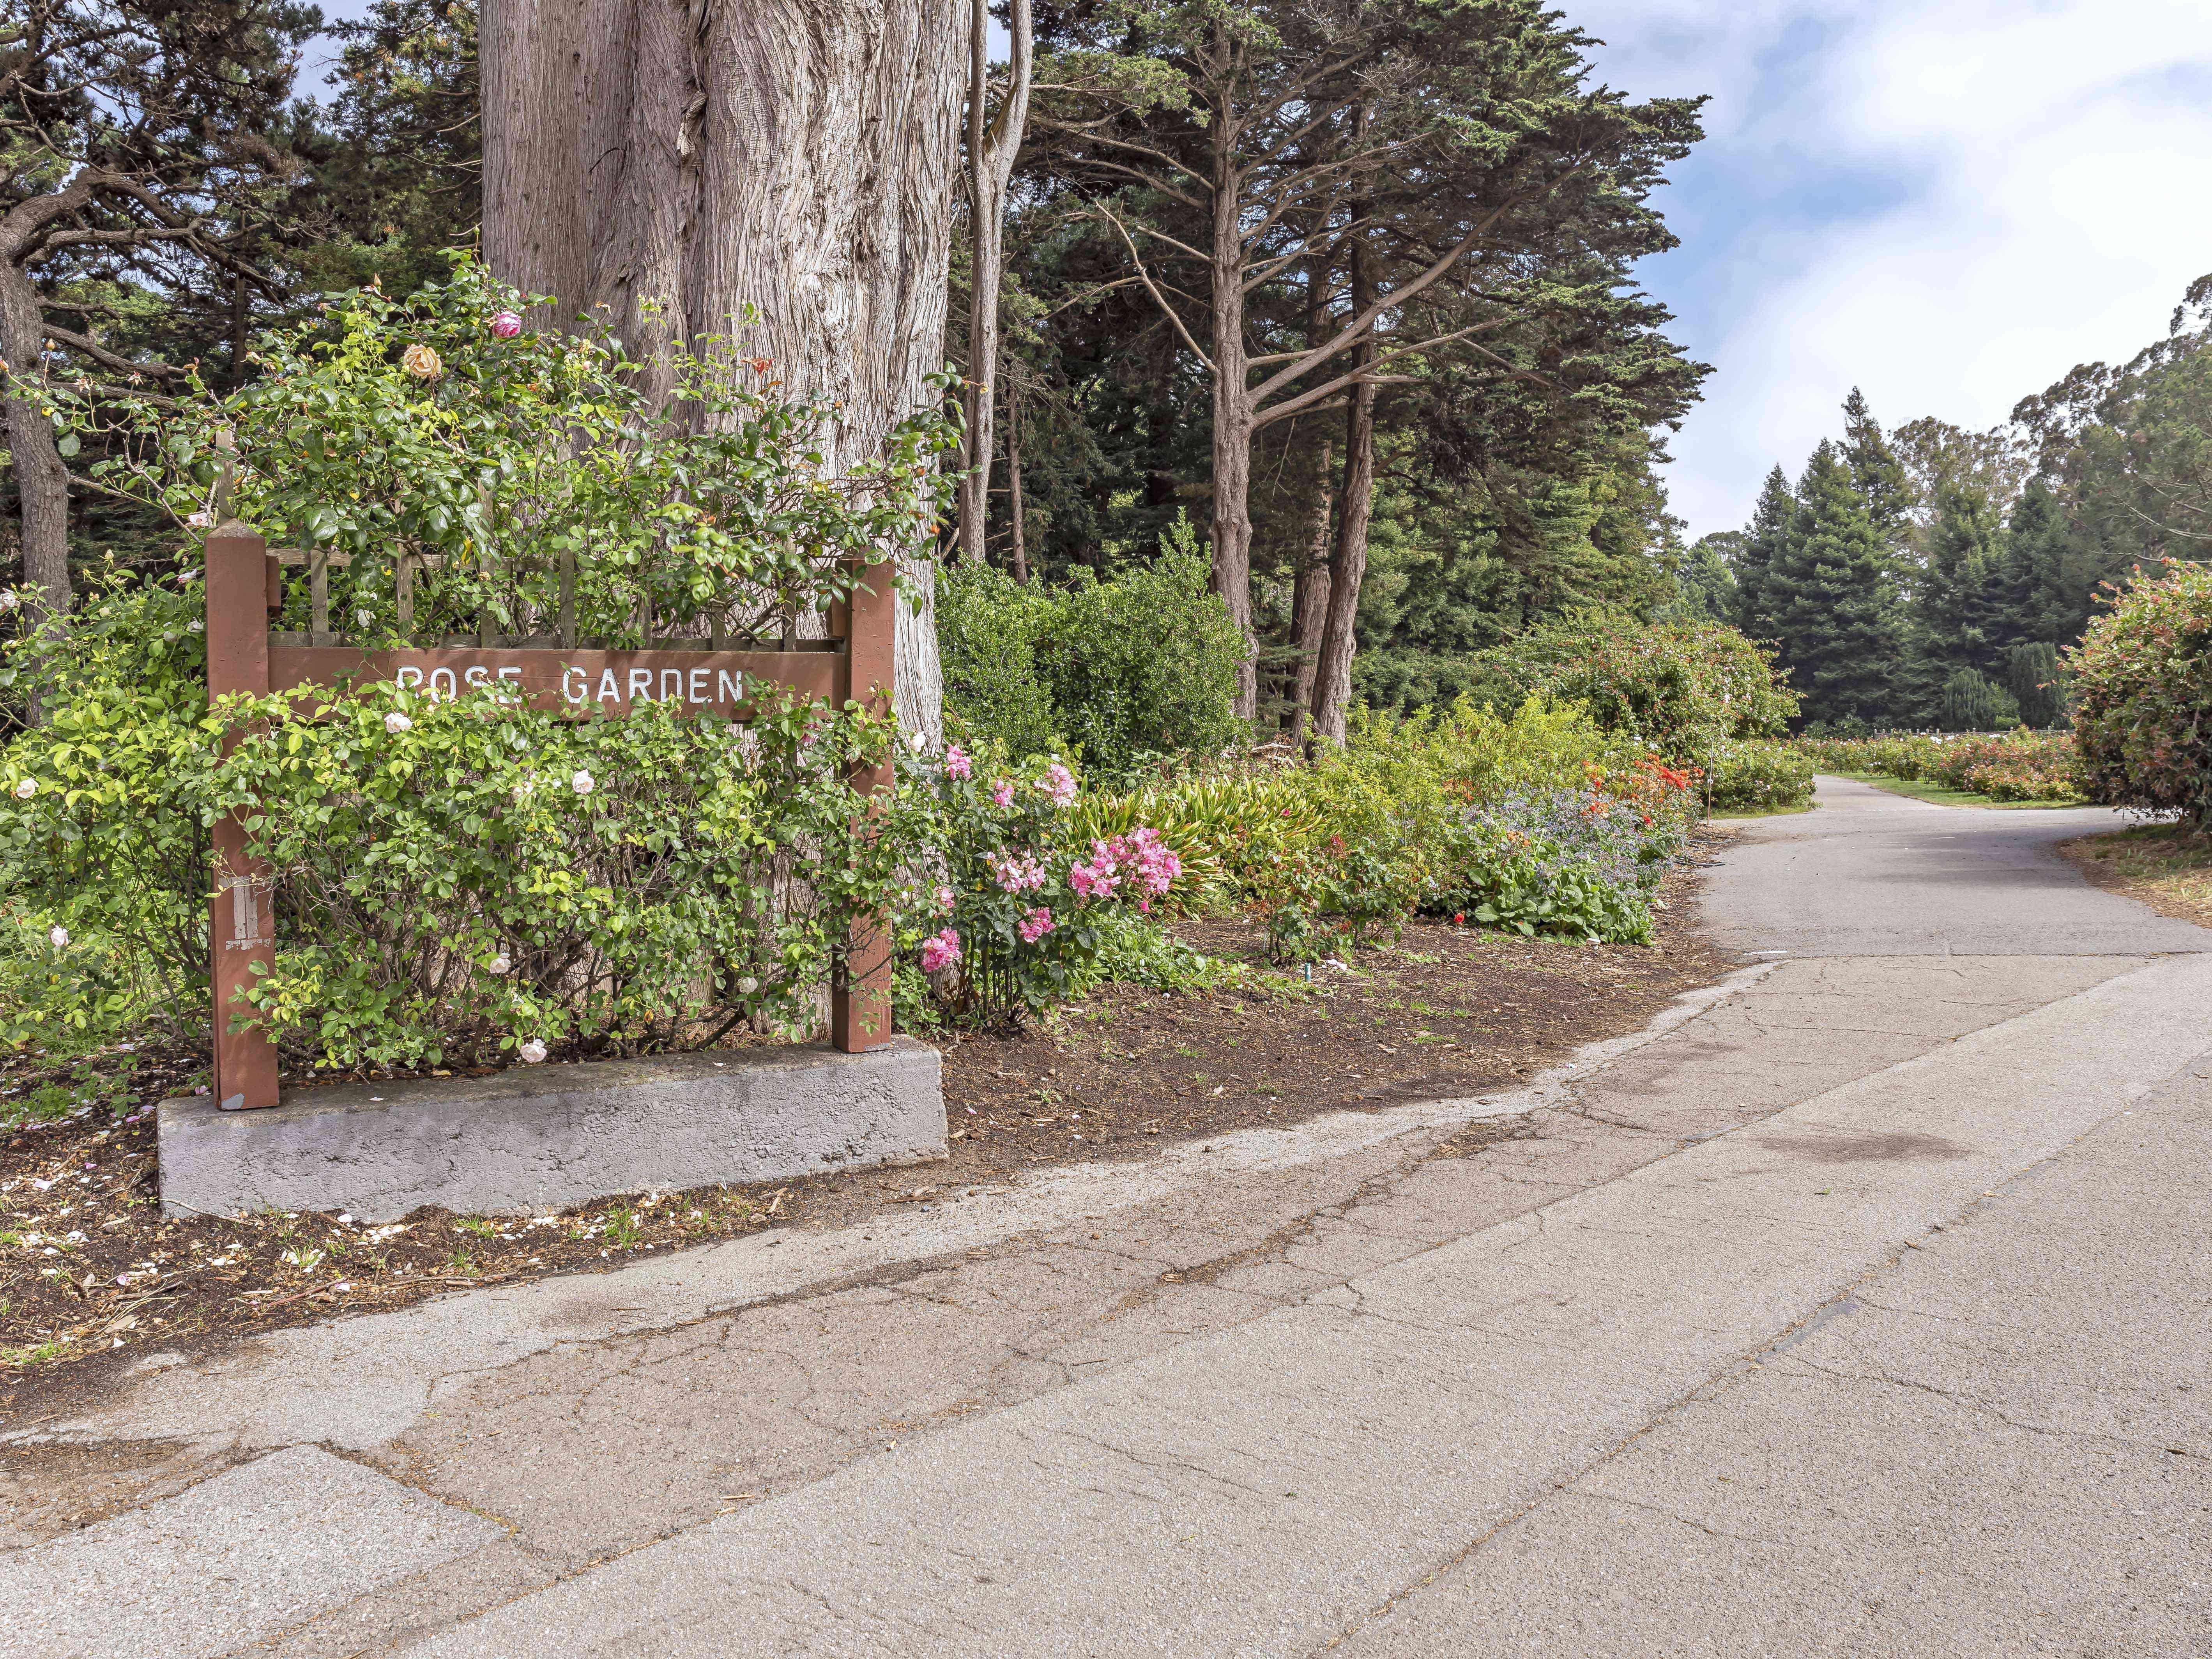 The rose garden sign overtaken by a rose bush